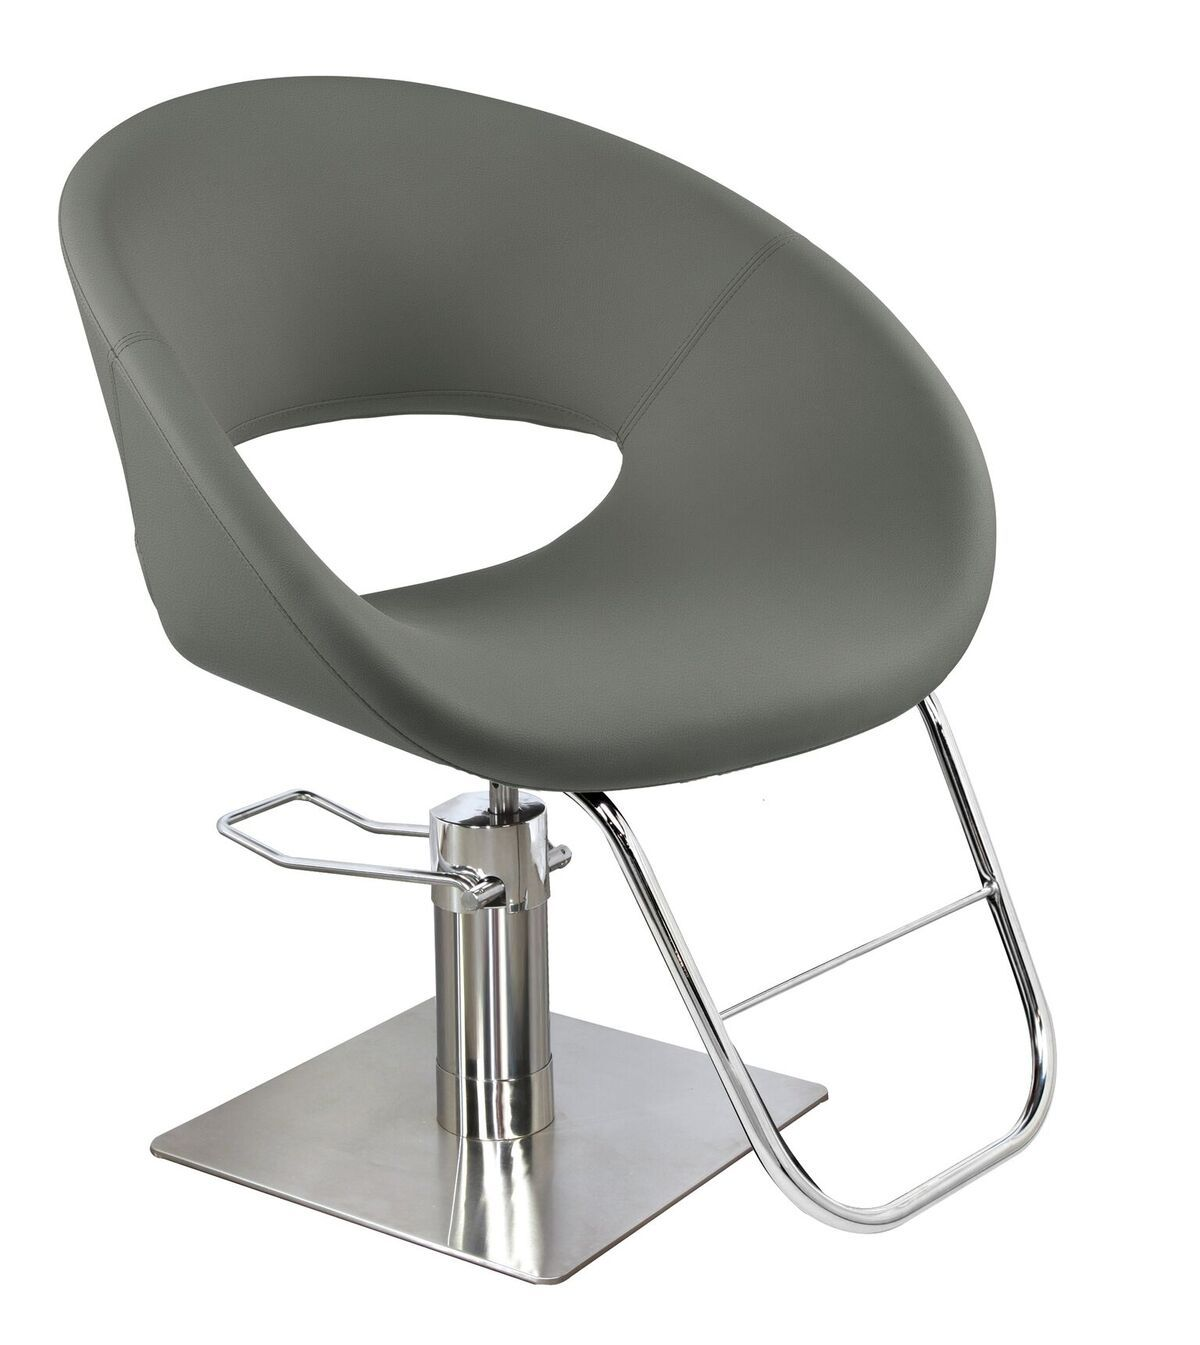 maletti tulipa salon chair ultra chic salon inspo pinterest rh pinterest com